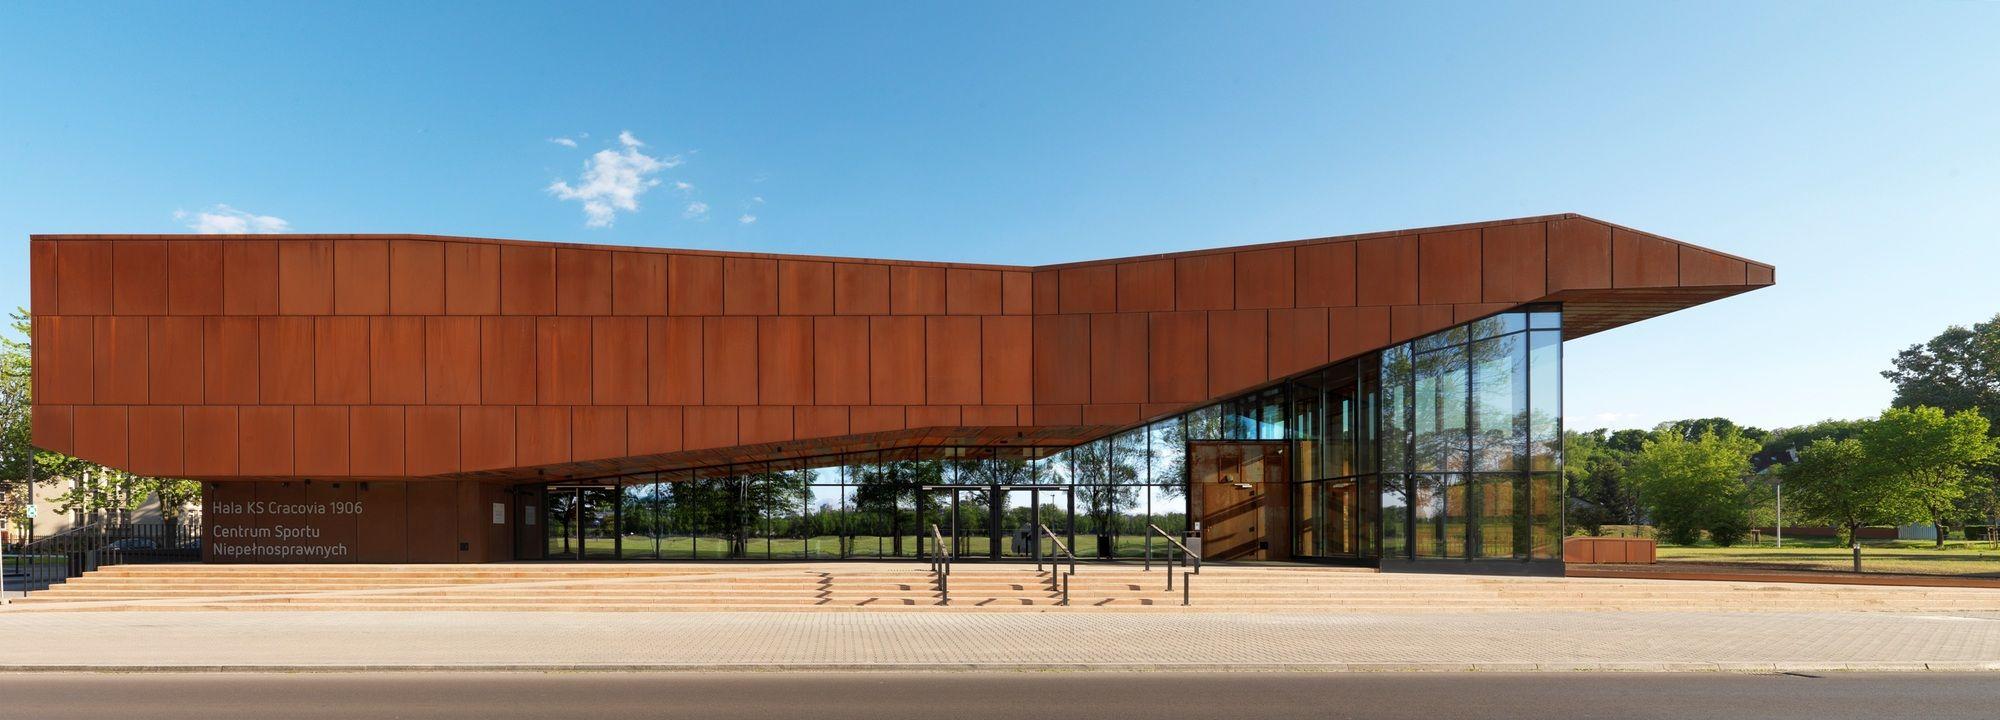 KS Cracovia 1906 Centennial Hall and Sports Center for the